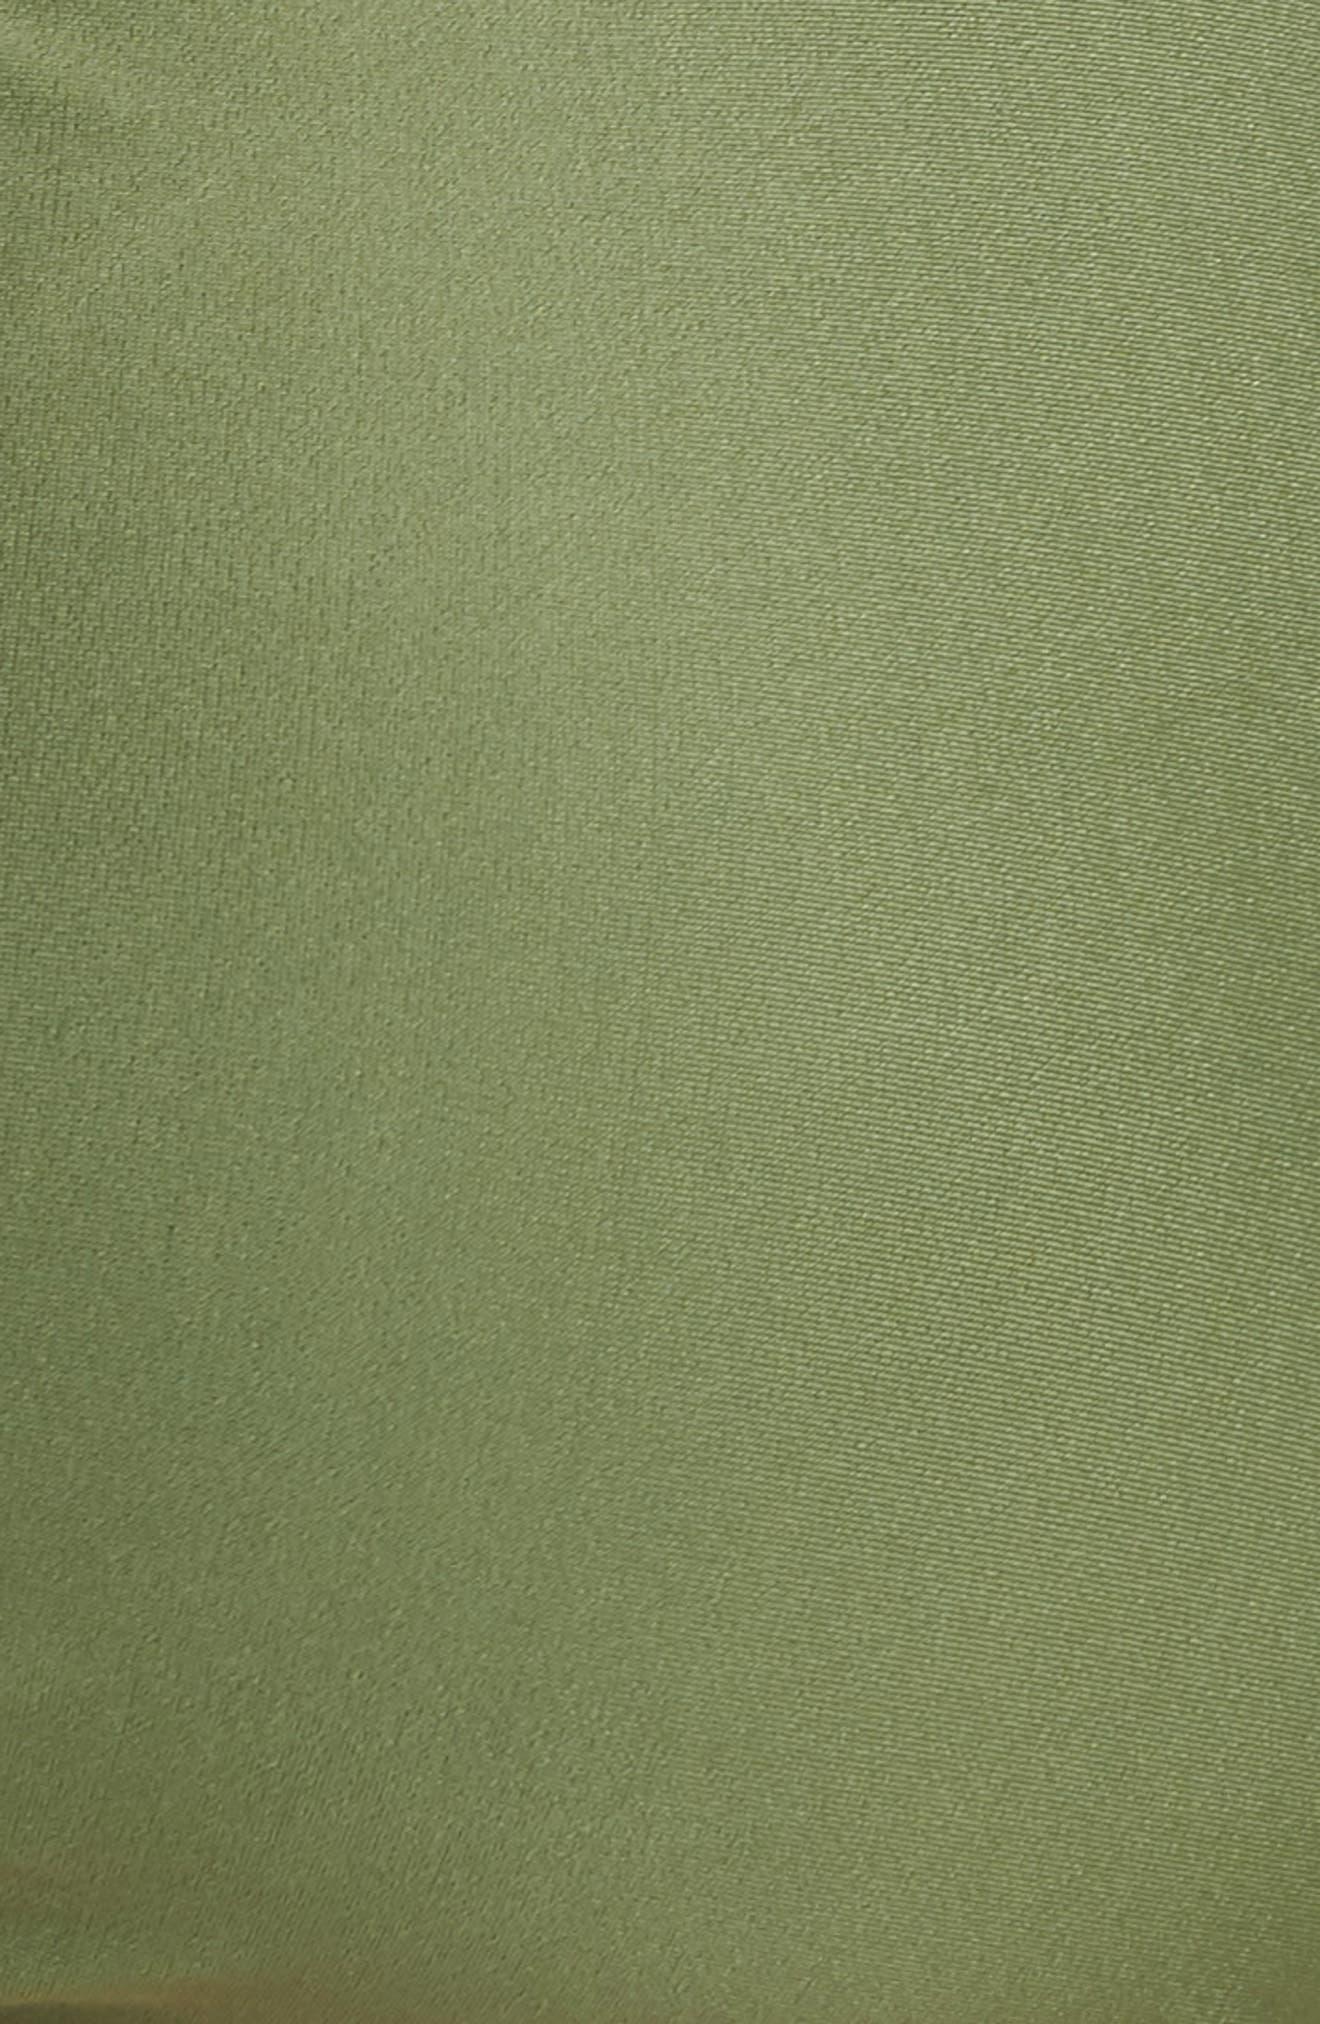 Enchanted Bralette,                             Alternate thumbnail 8, color,                             Moss